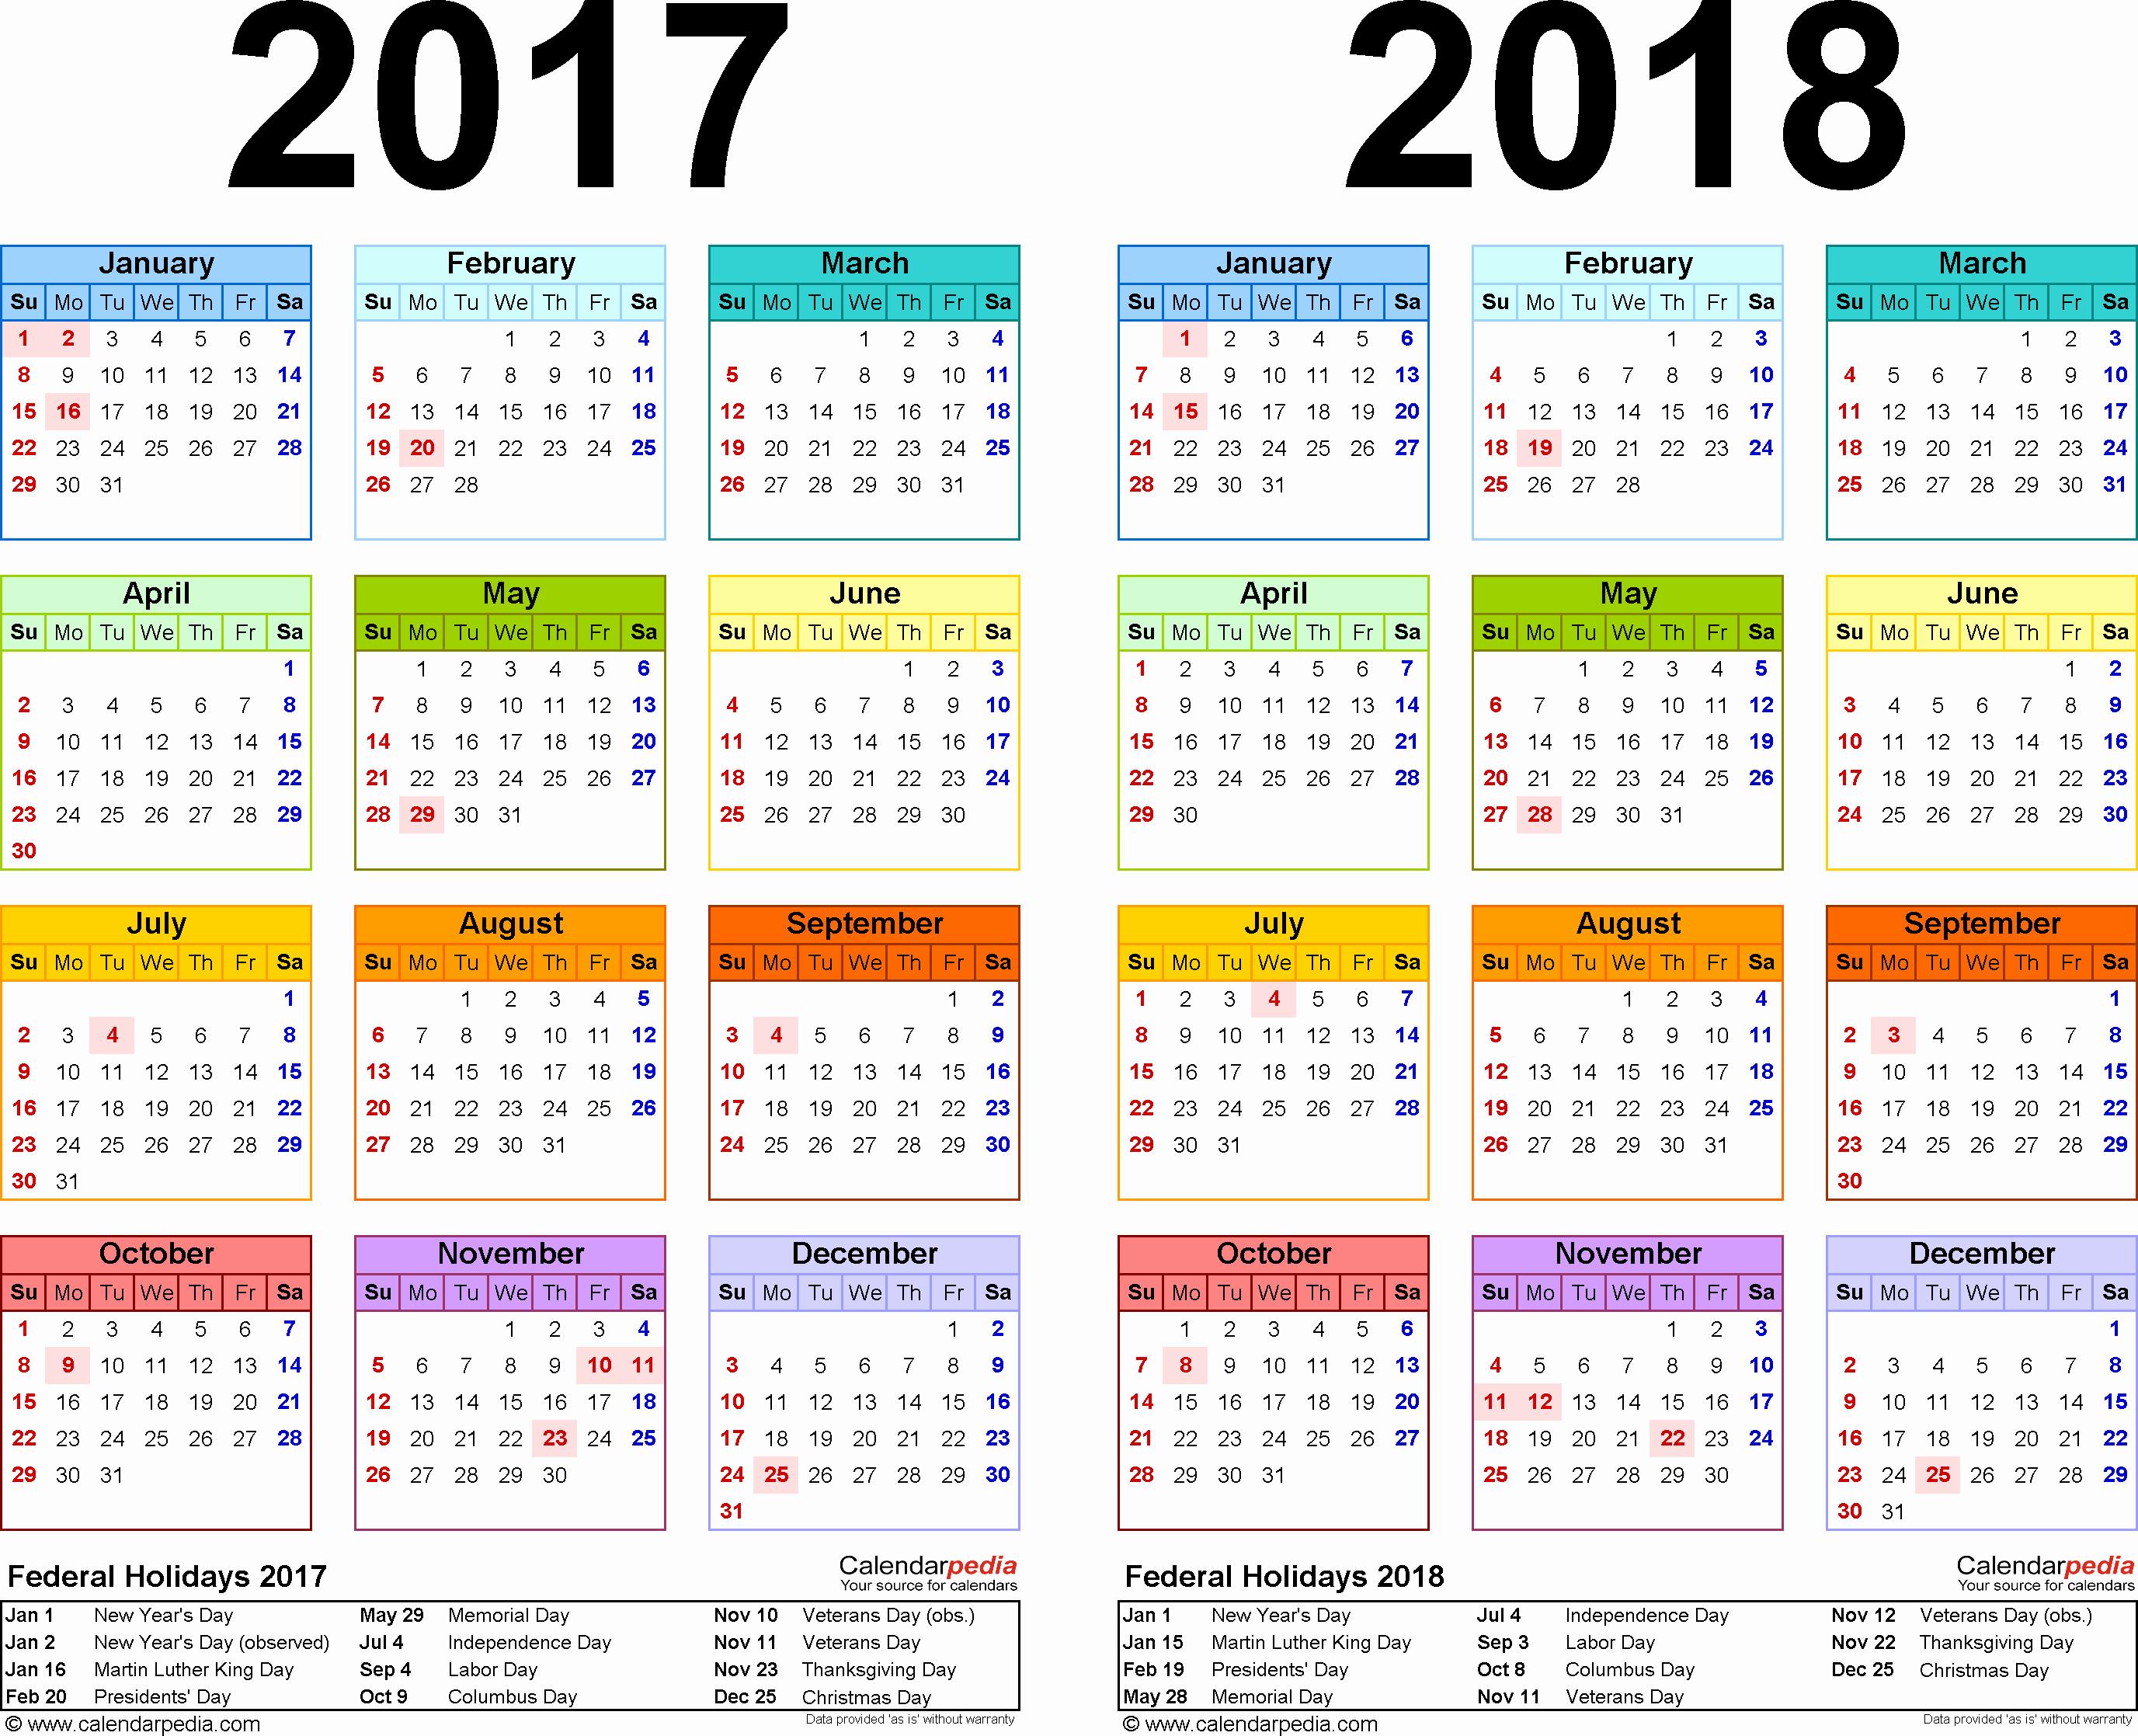 Weekly Calendar Template 2017 Unique Weekly Calendar 2018